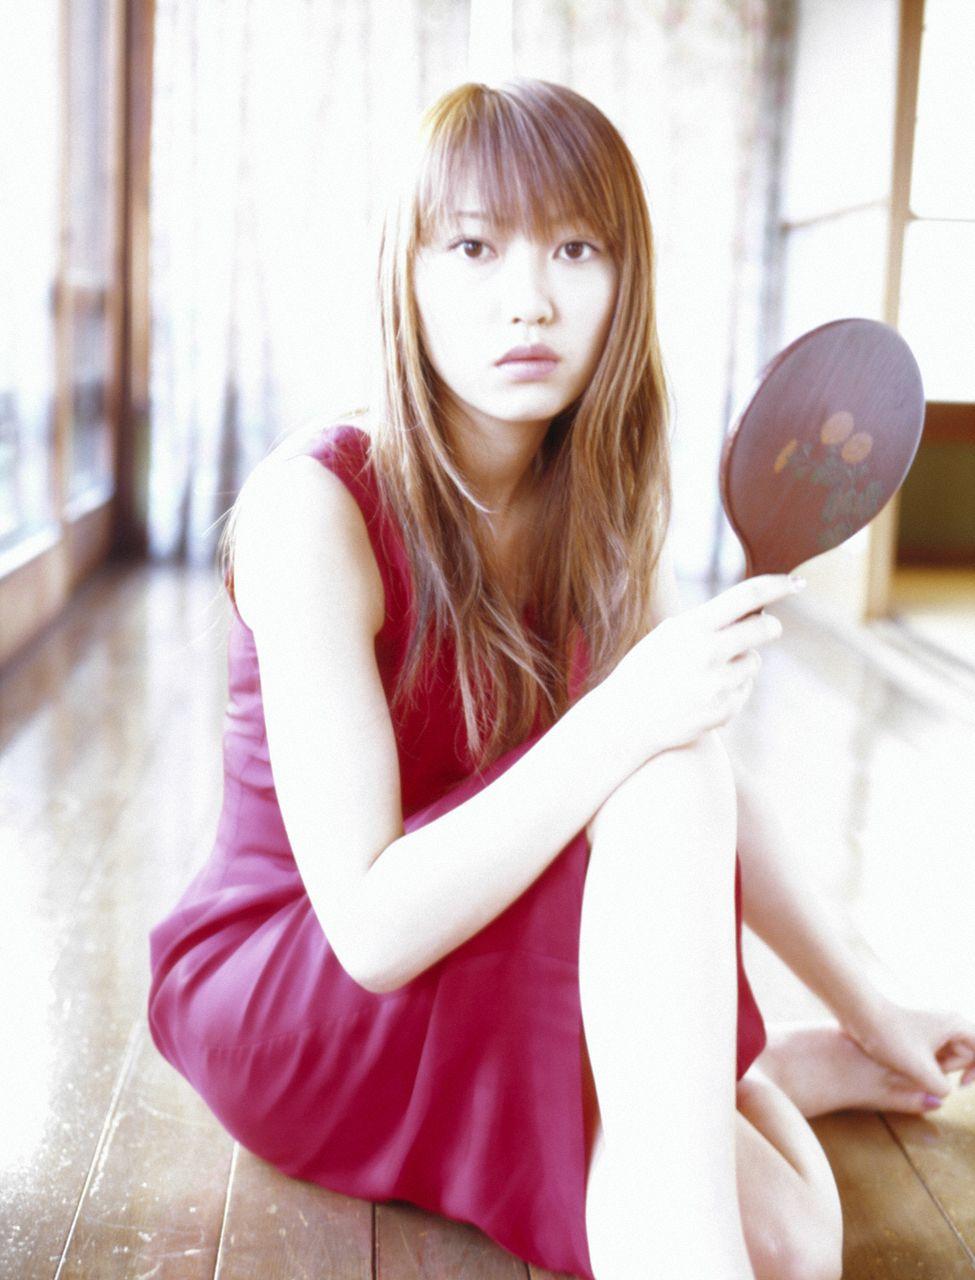 [Hello! Project Digital Books]No.27 Yuko Nakazawa 中澤裕子 + Kaori Iida 飯田圭織 + Natsumi Abe 安倍な[102P] Hello! Project 第4张